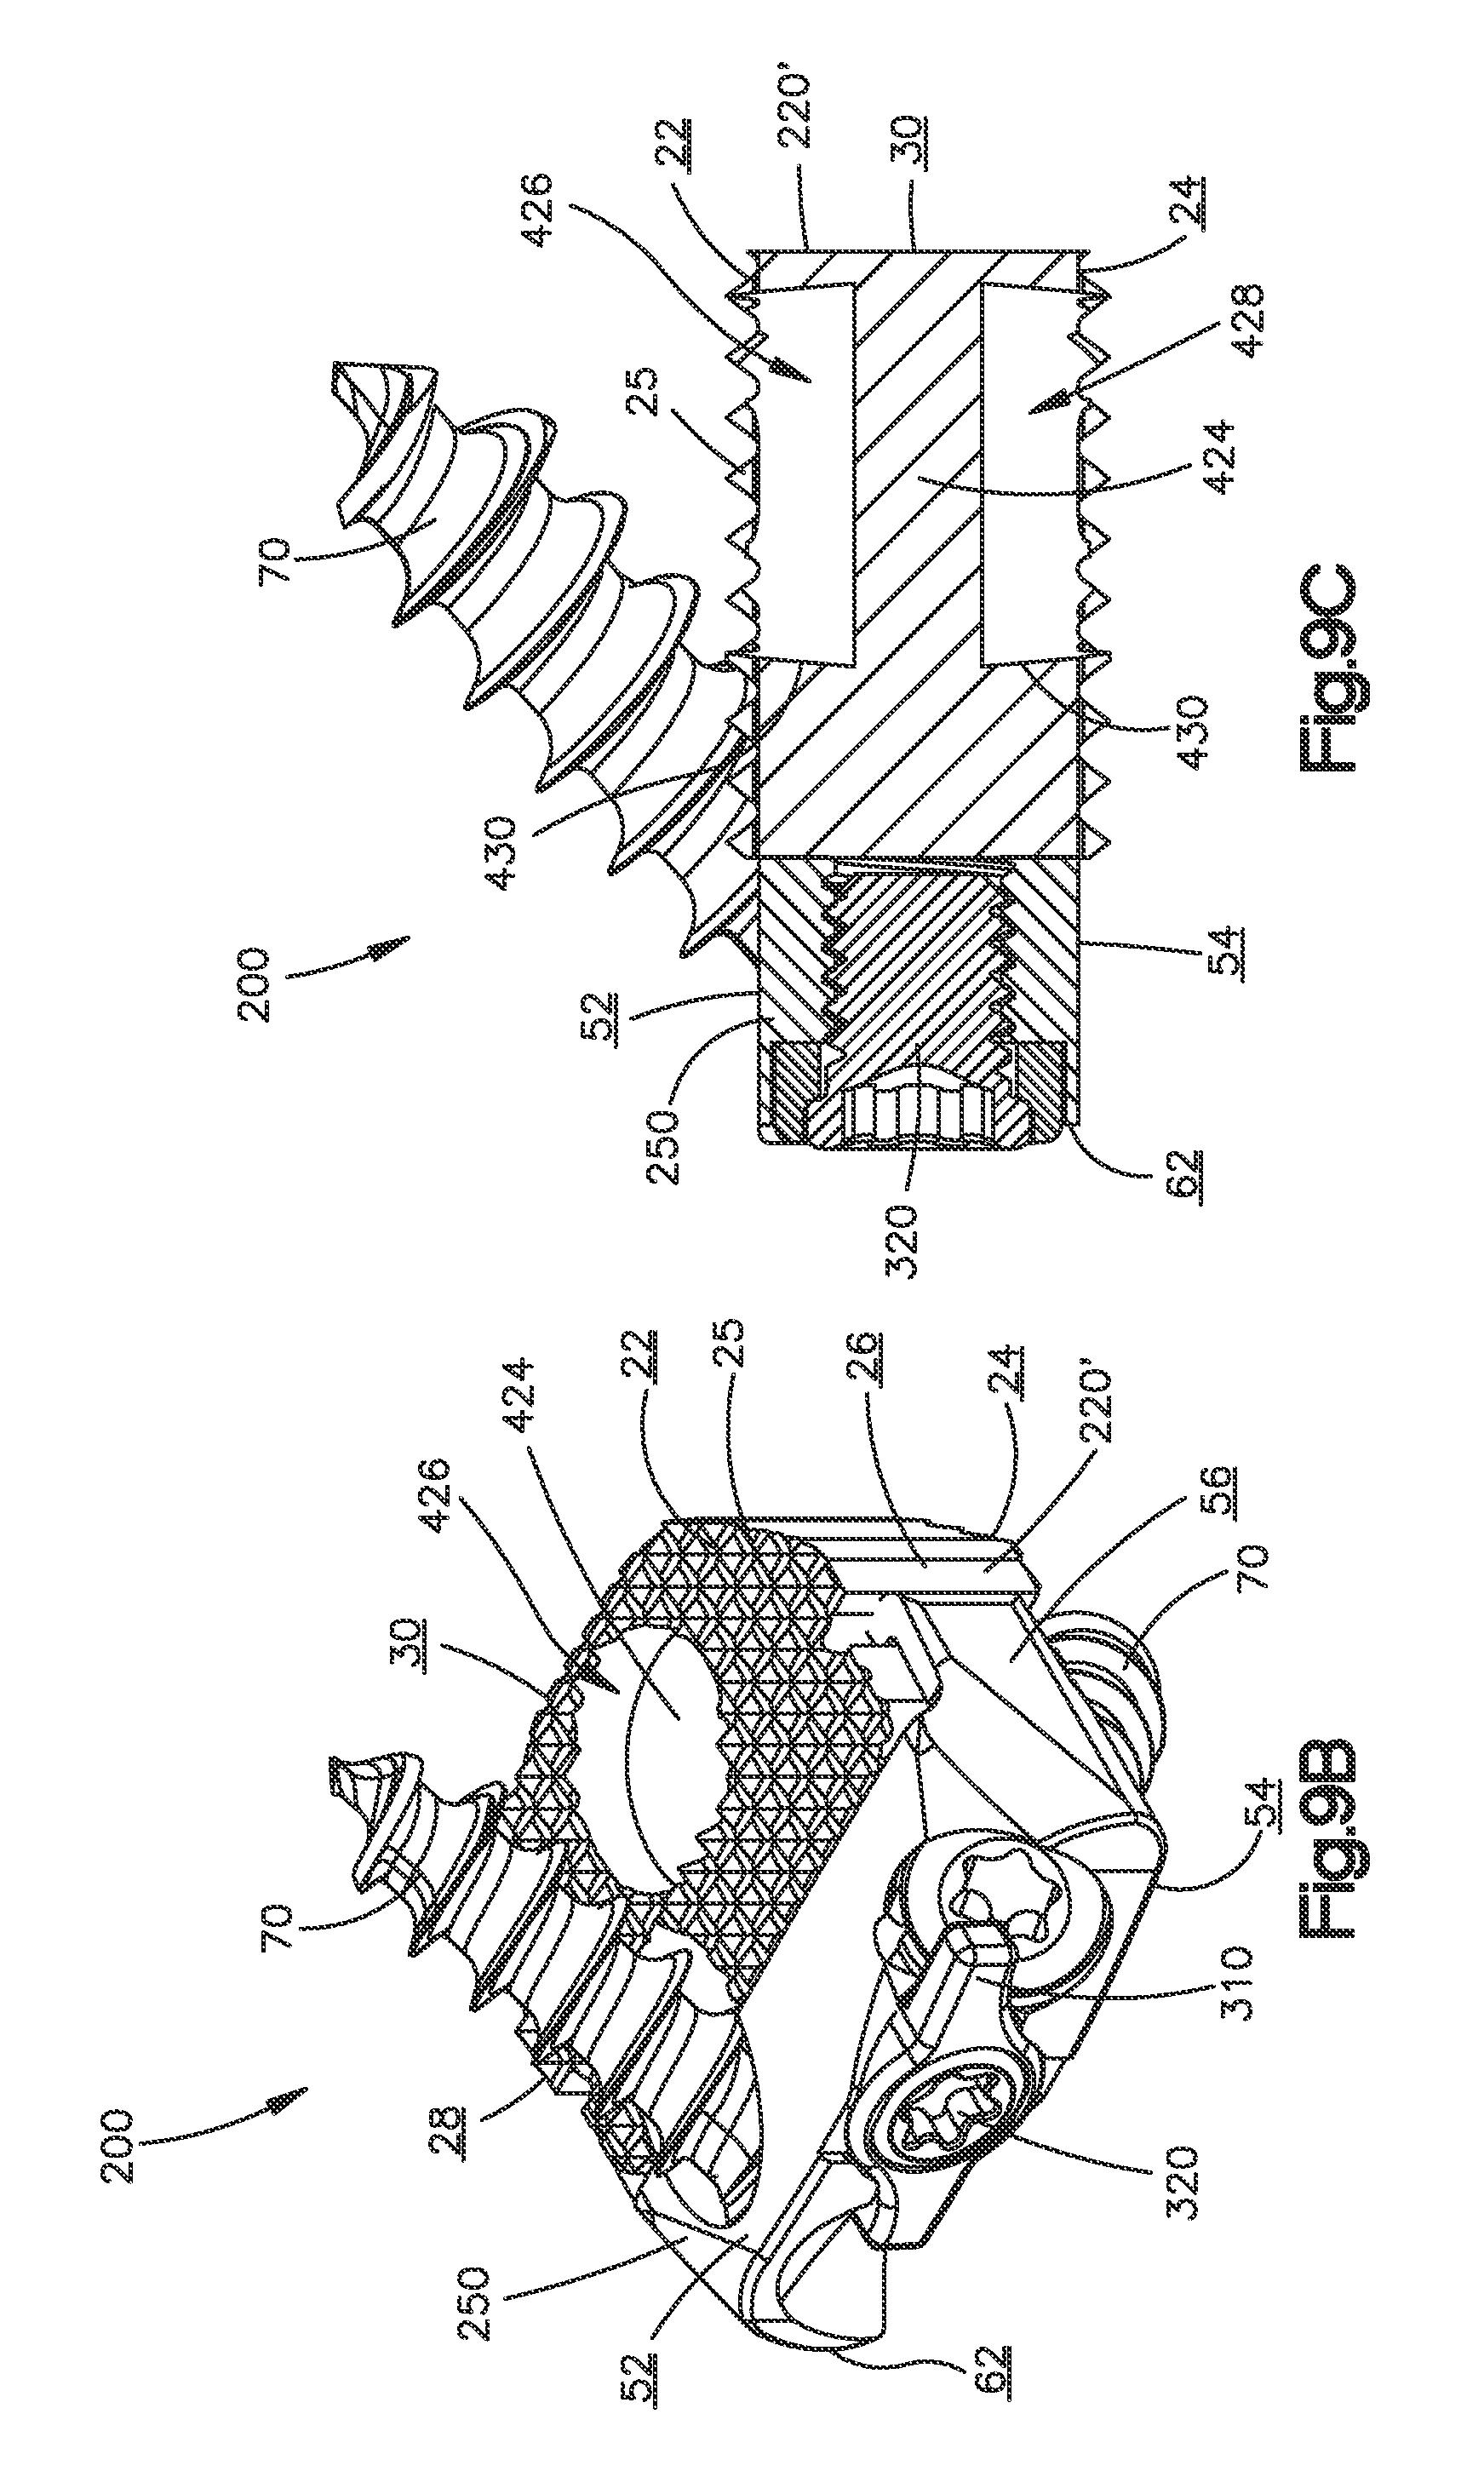 Chevrolet Cobalt Engine Diagram